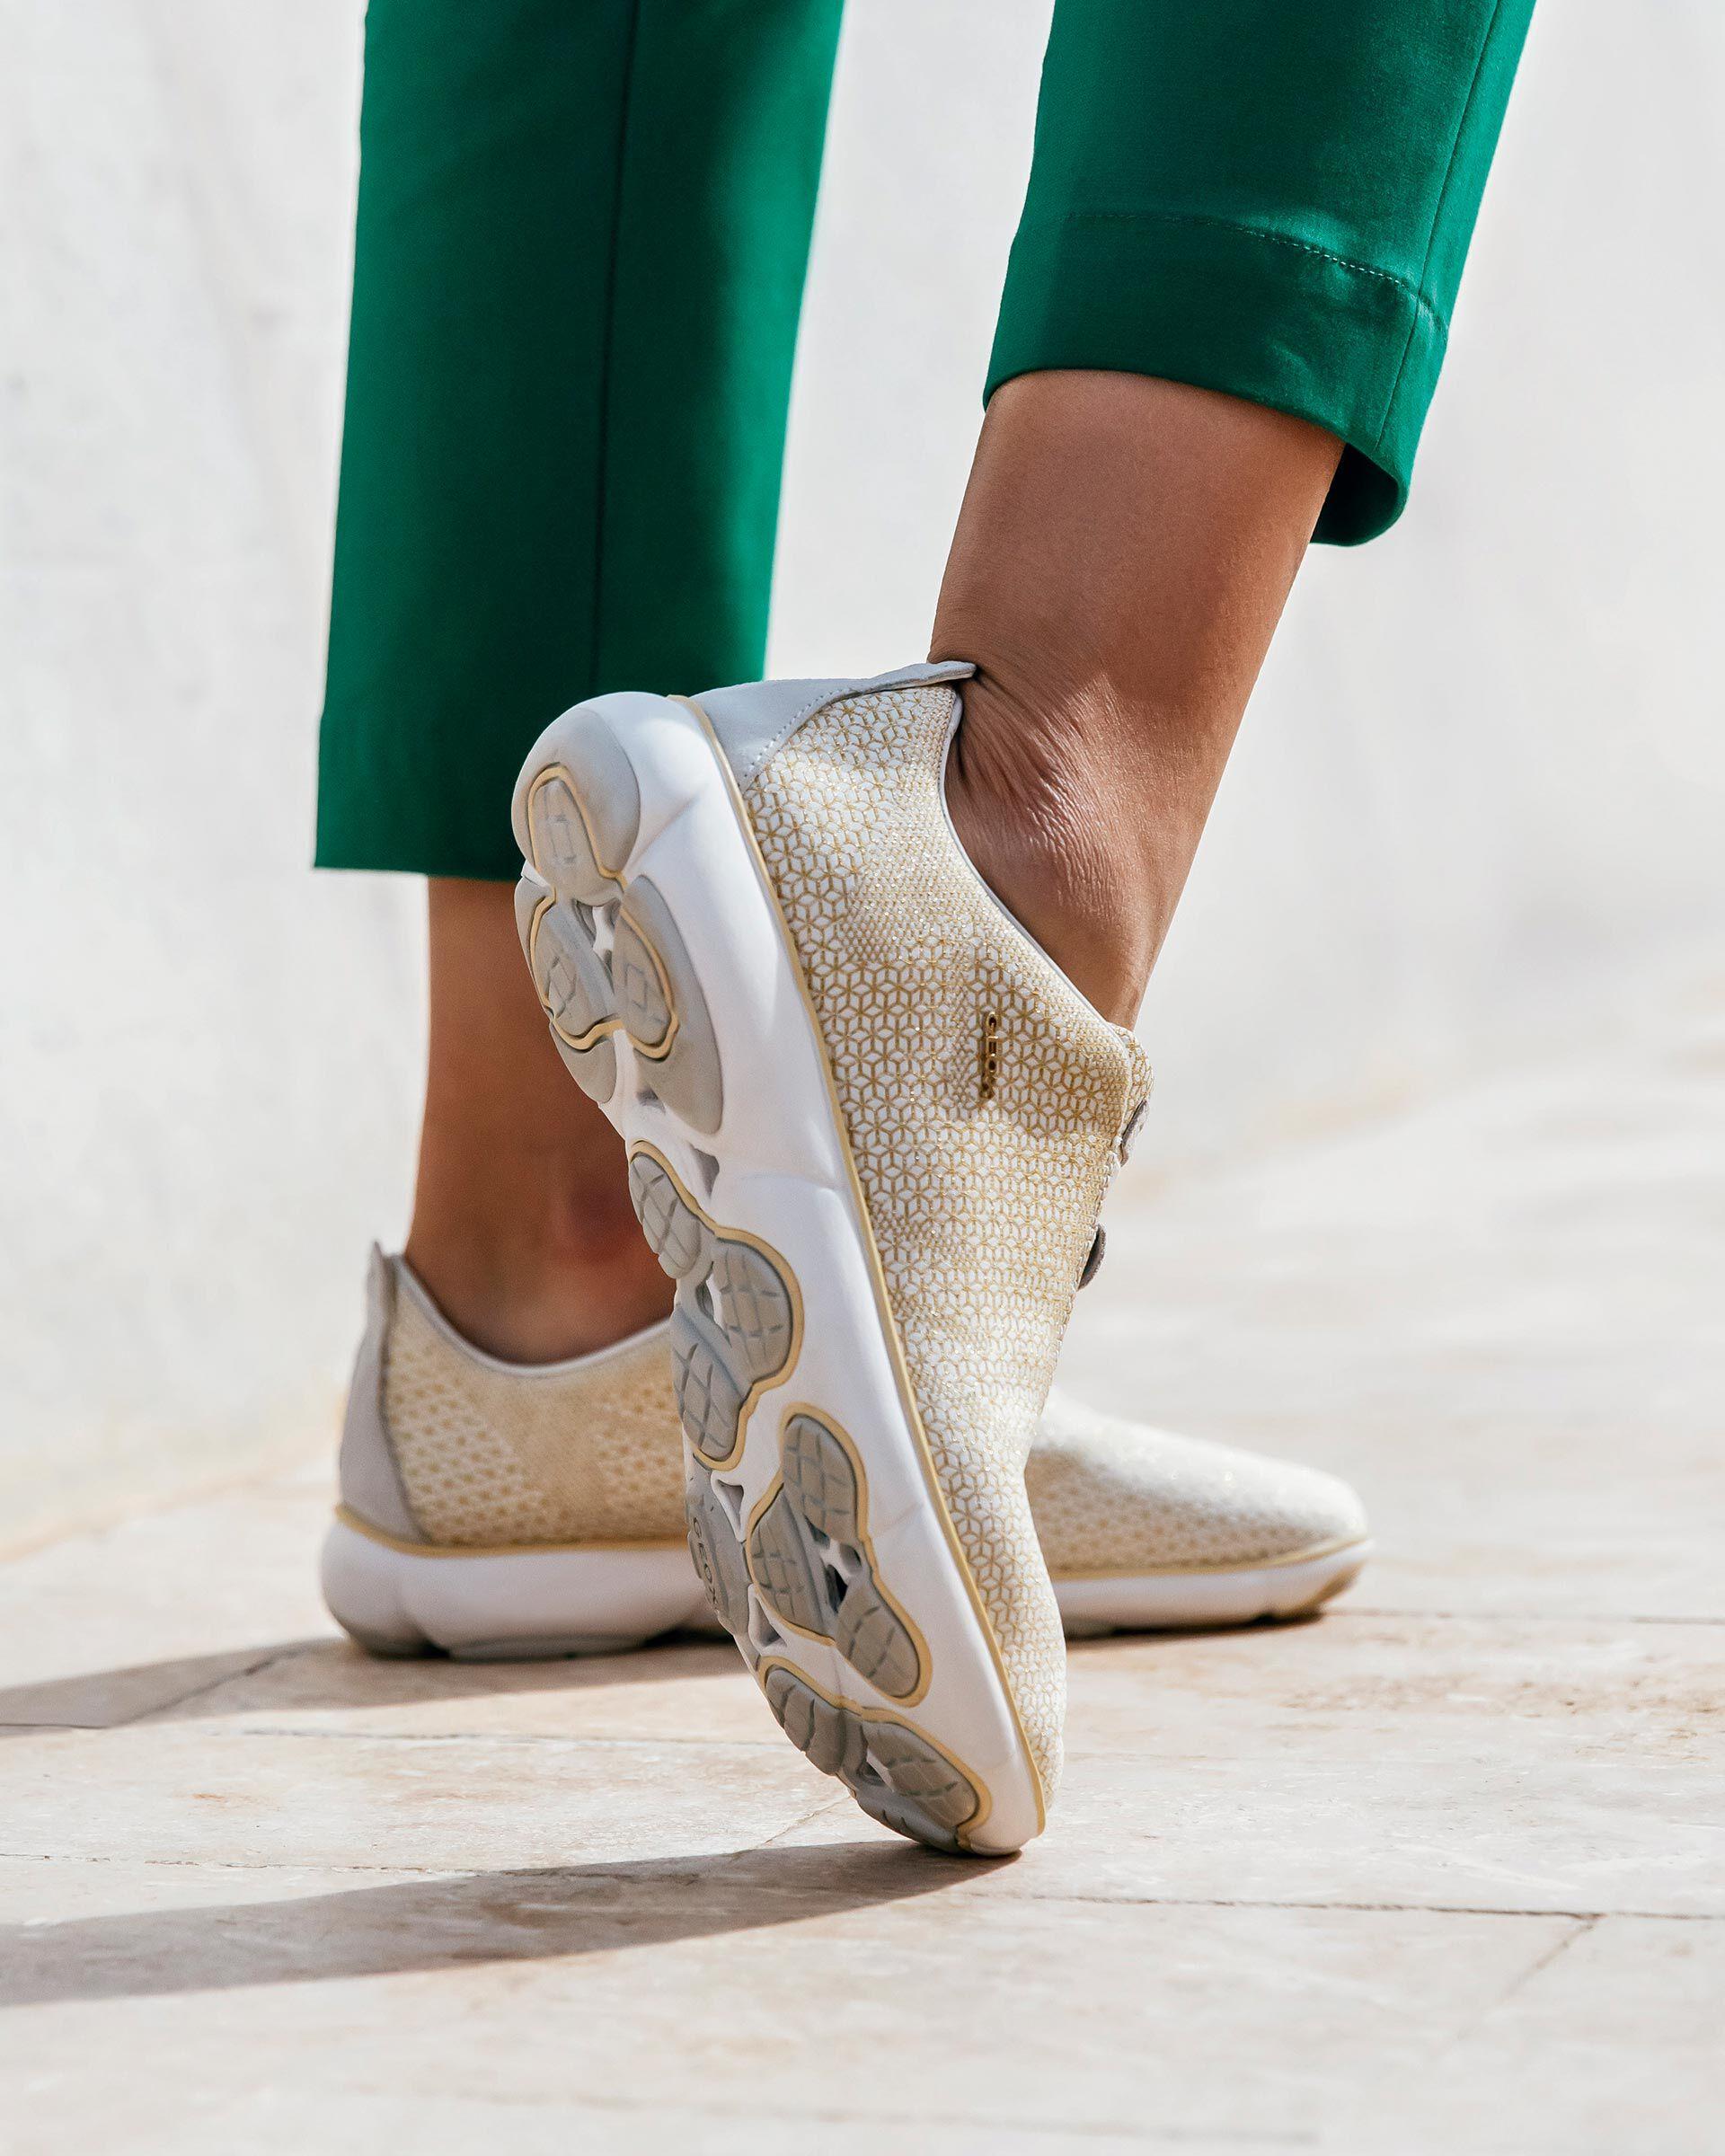 Geox NEBULA Woman: Off-white Sneakers